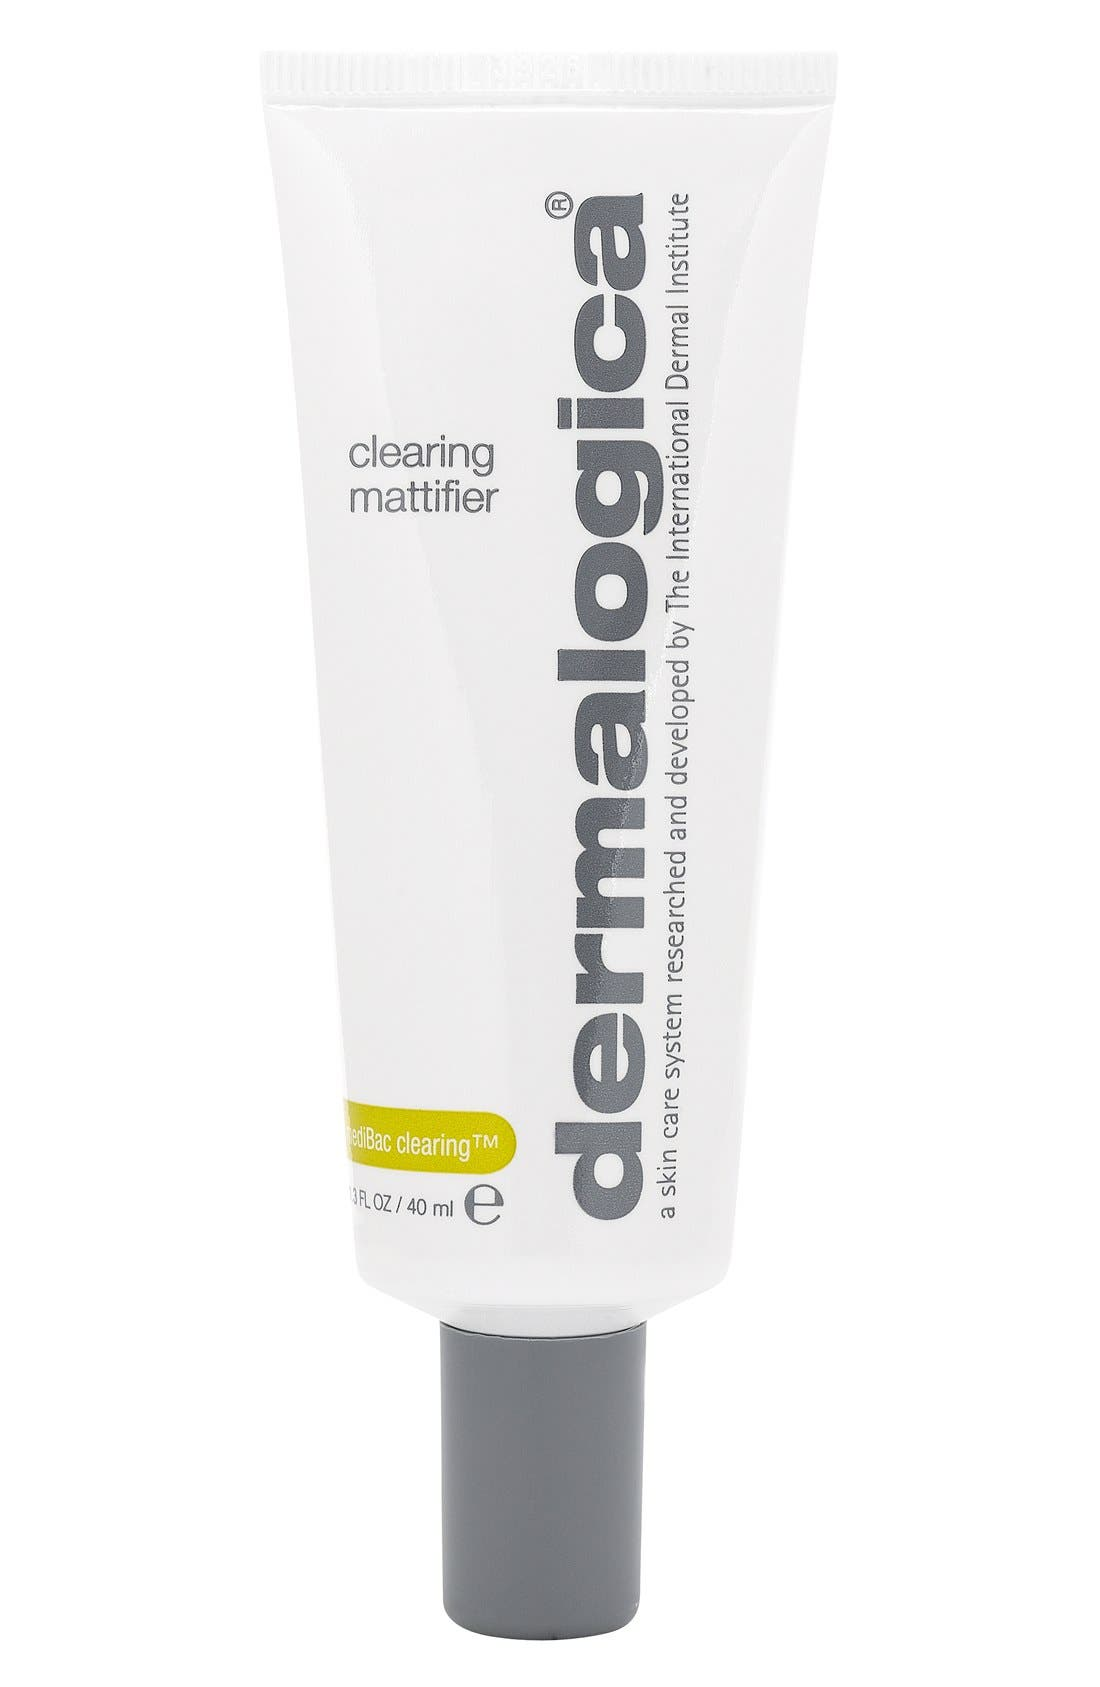 dermalogica® Clearing Mattifier